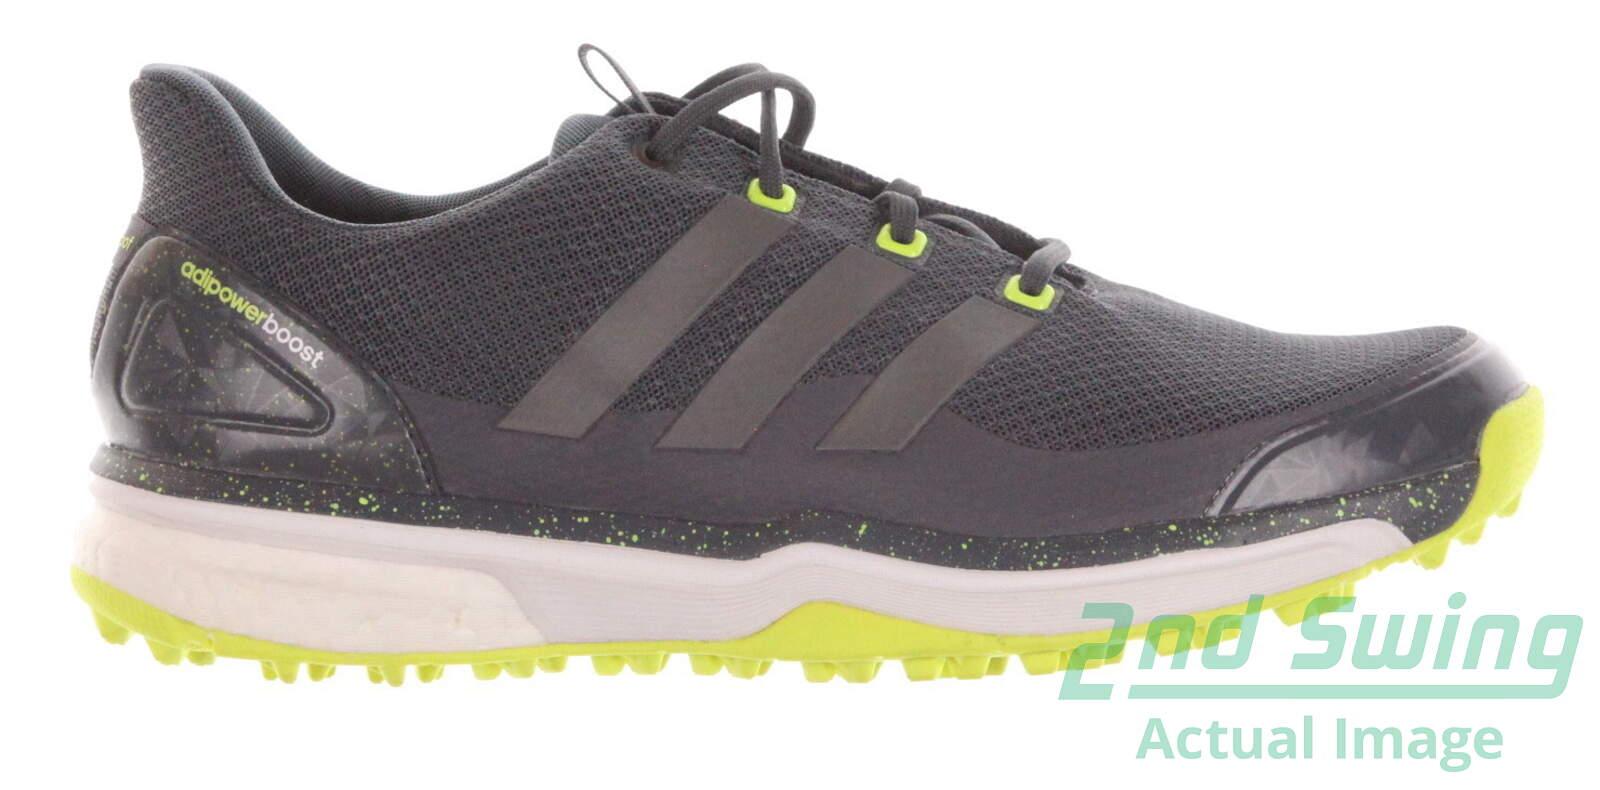 New hombre  zapatos de golf Adidas Adipower Sport Boost 2 Medium 10 gris